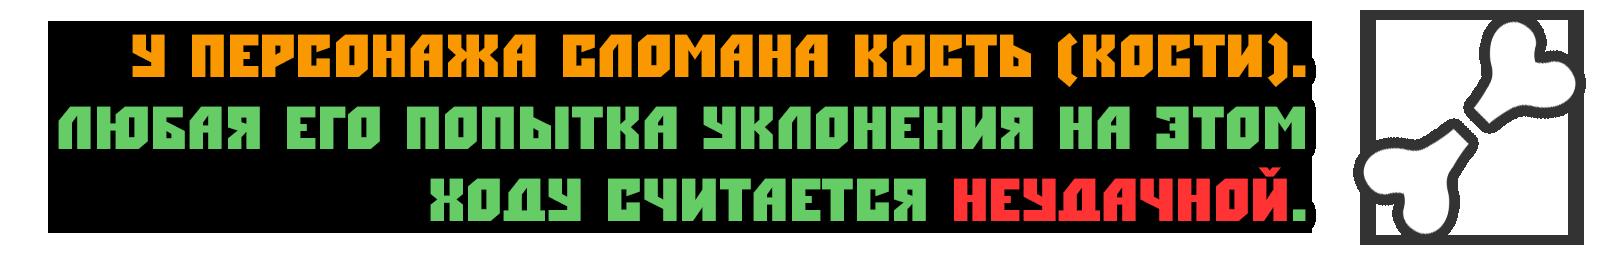 Тест боевой системы O4ki_Urona_Slomannaja_kost_Forum_Vova_8